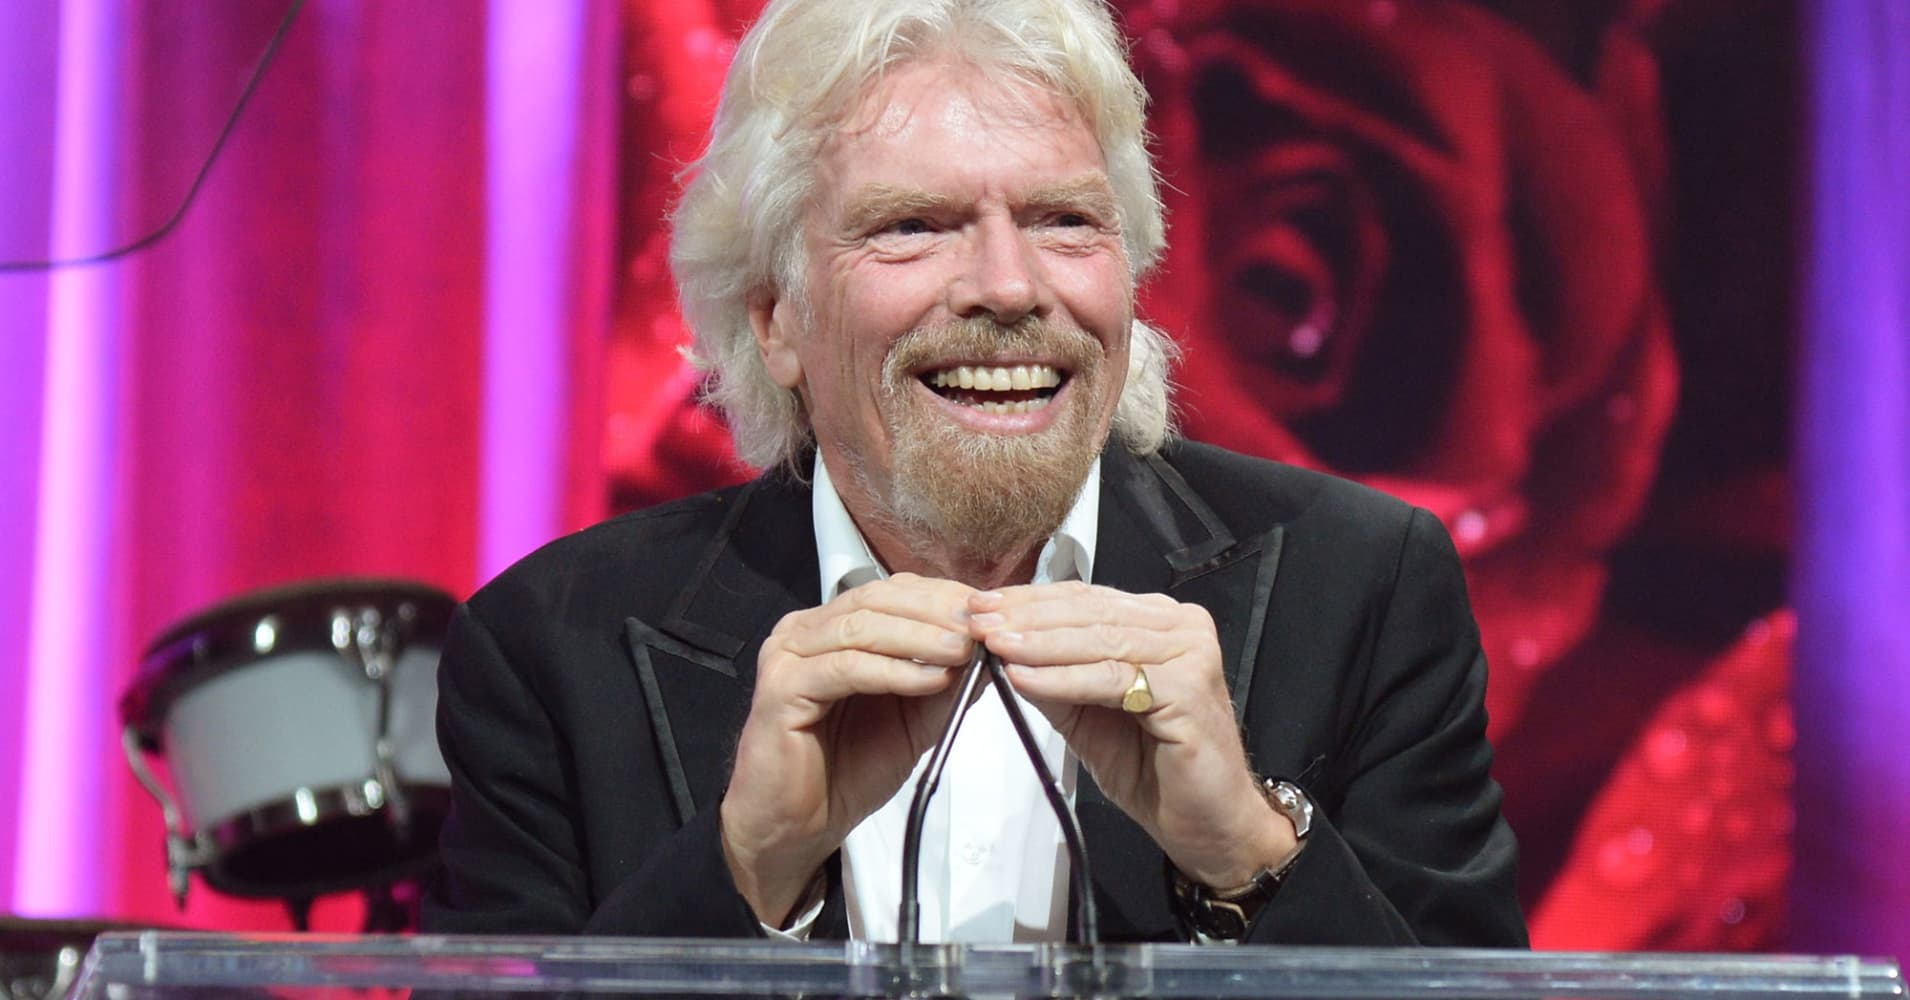 Billionaire Richard Branson S Definition Of Success Has